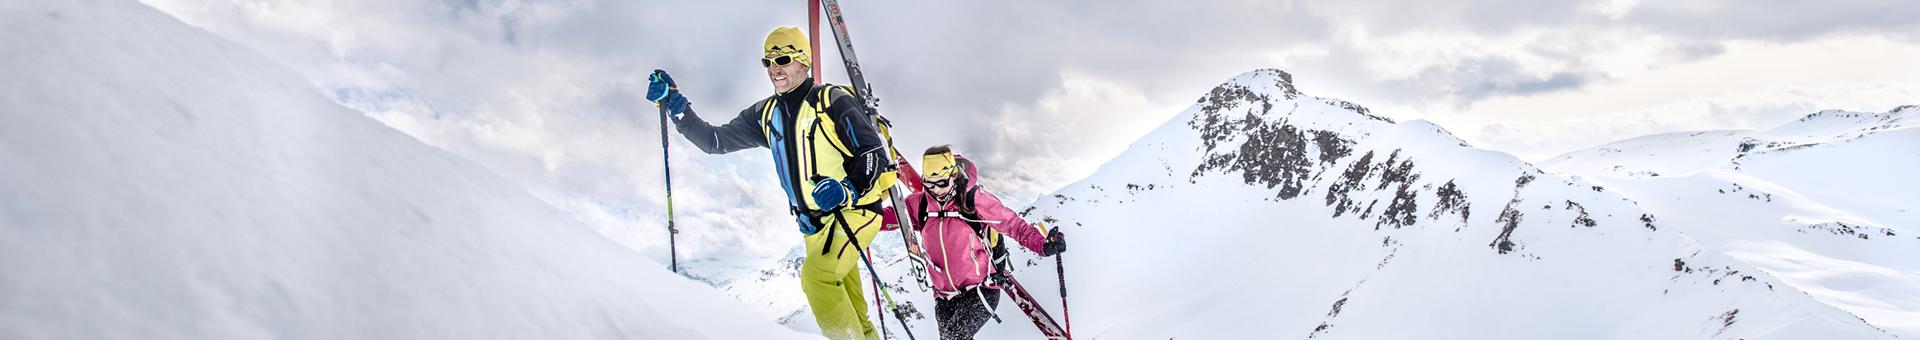 Bastoncini da scialpinismo / gara